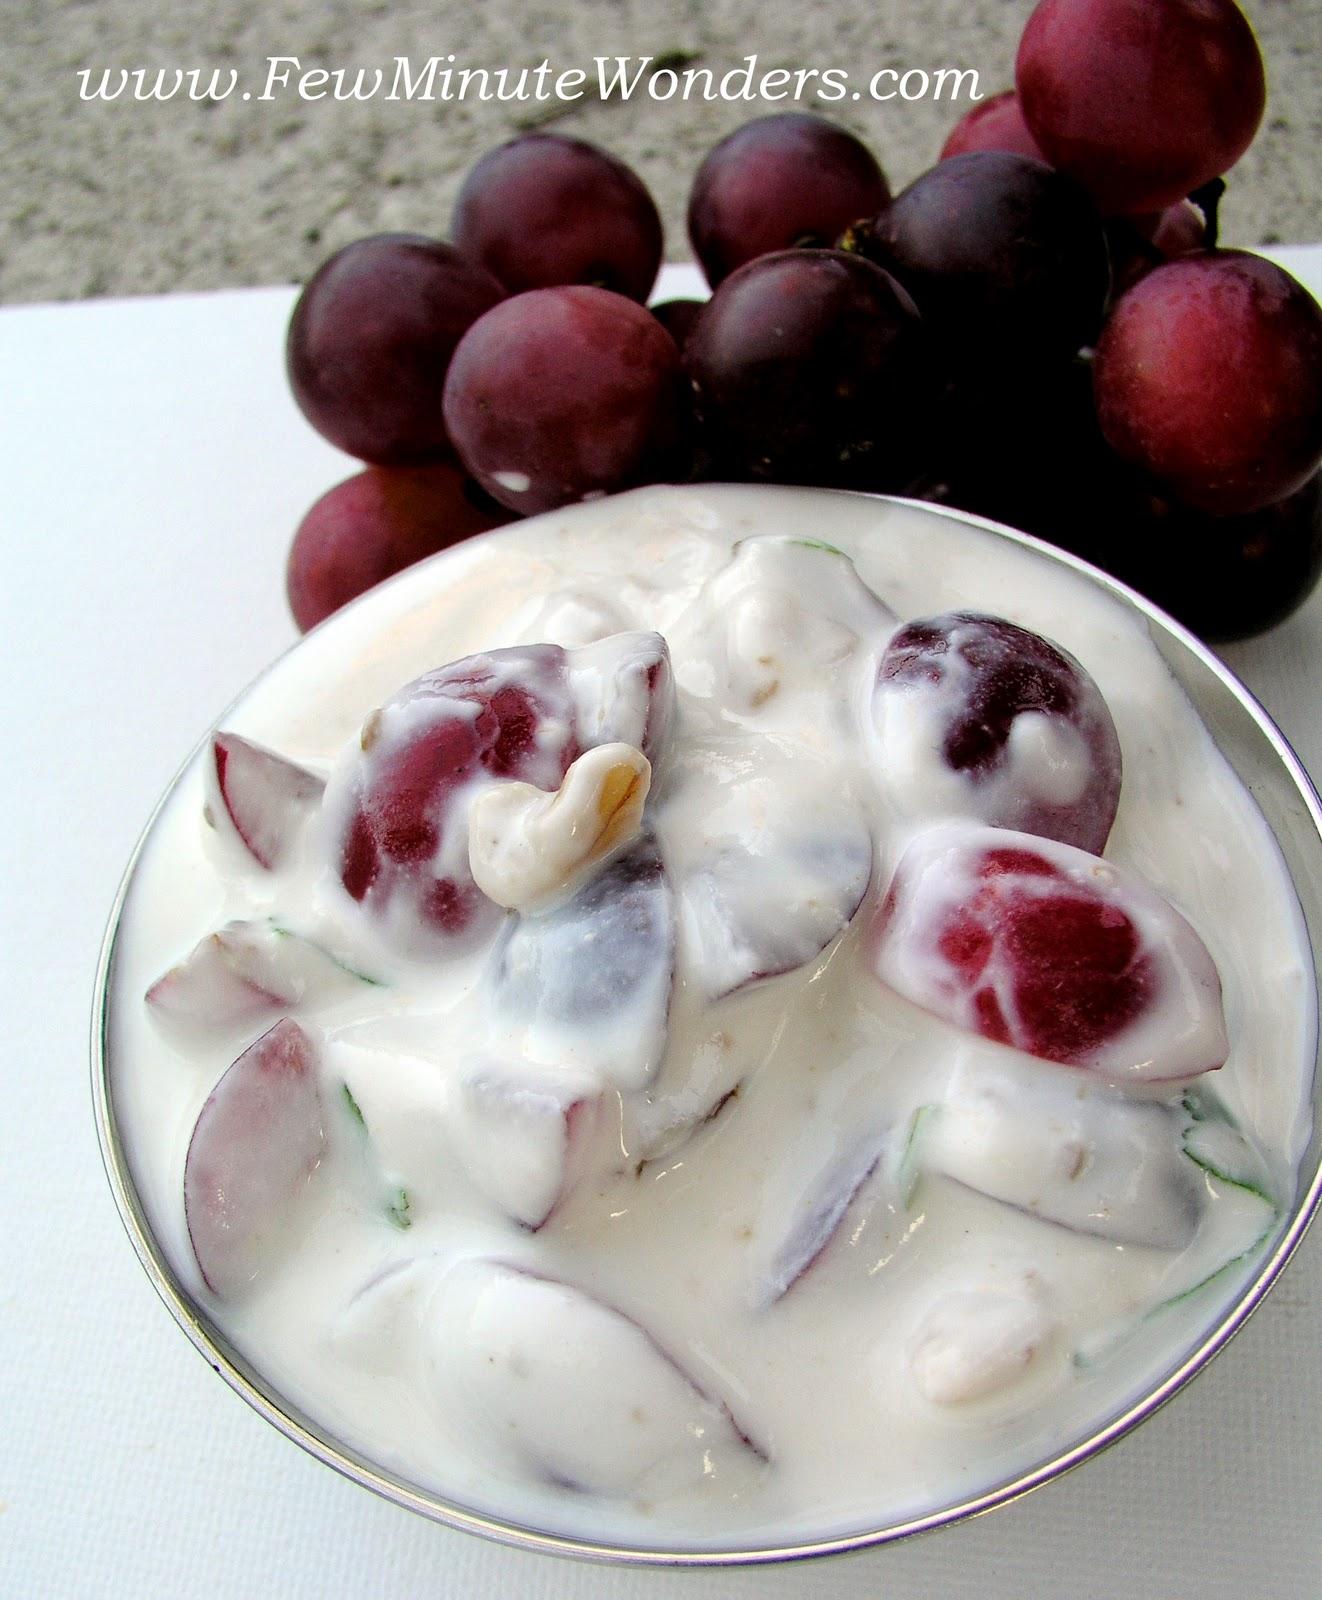 Grapes and Walnut Raita | fewminutewonders